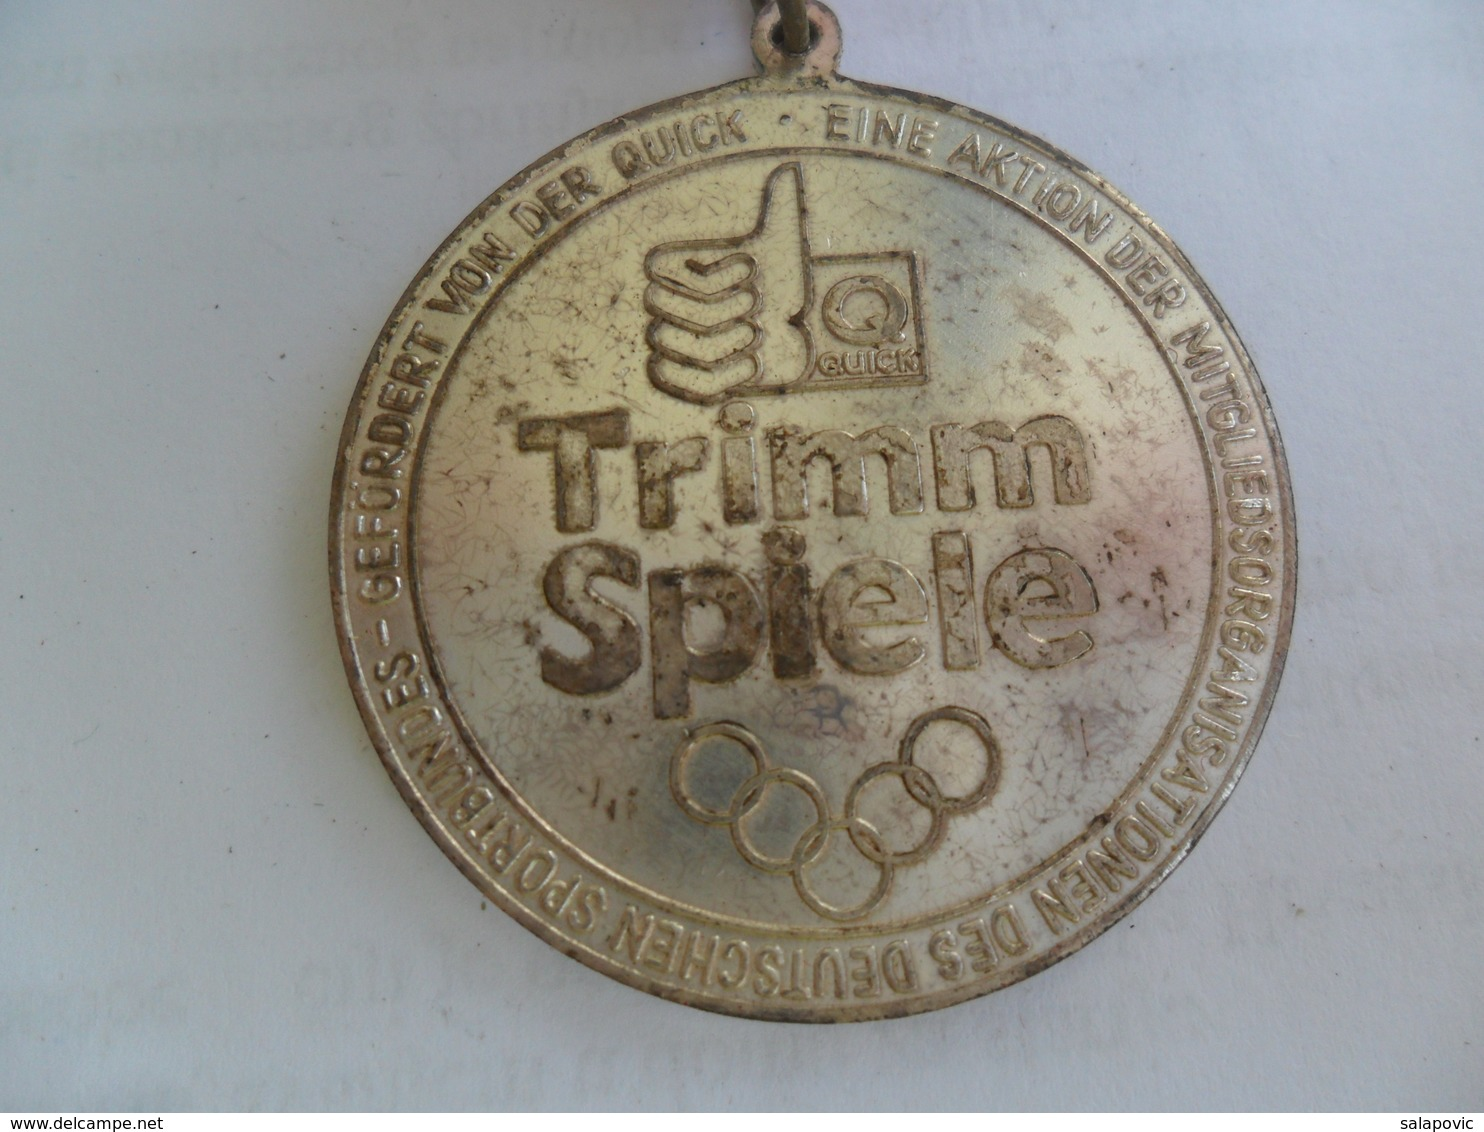 MEDAL SPORT TRIMM SPIELE QUICK    KUT - Sports